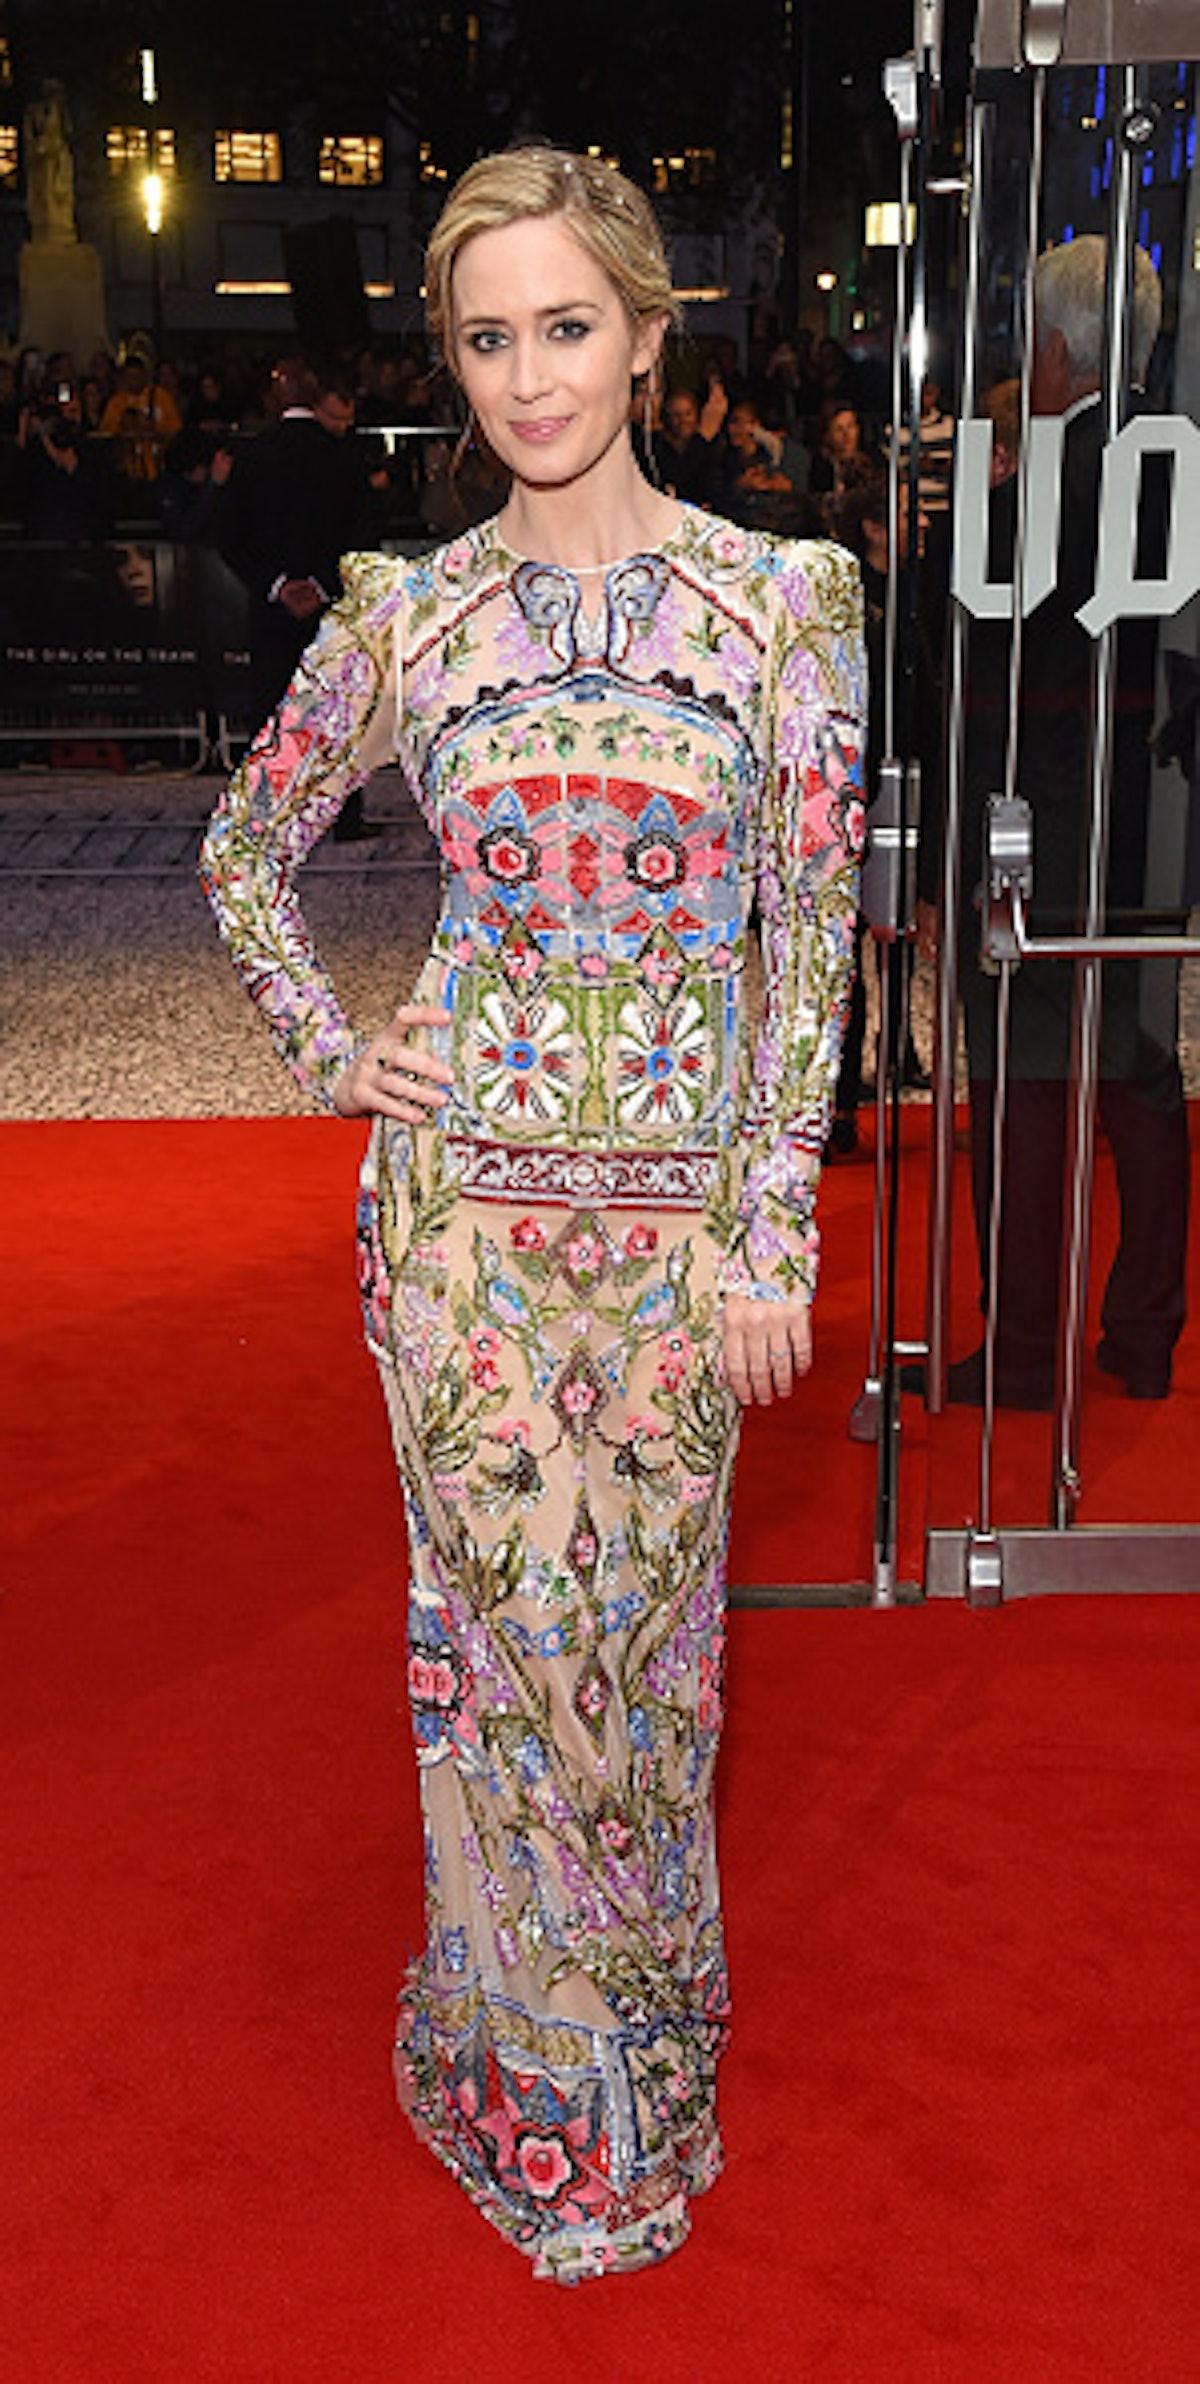 Emily Blunt in floral dress.